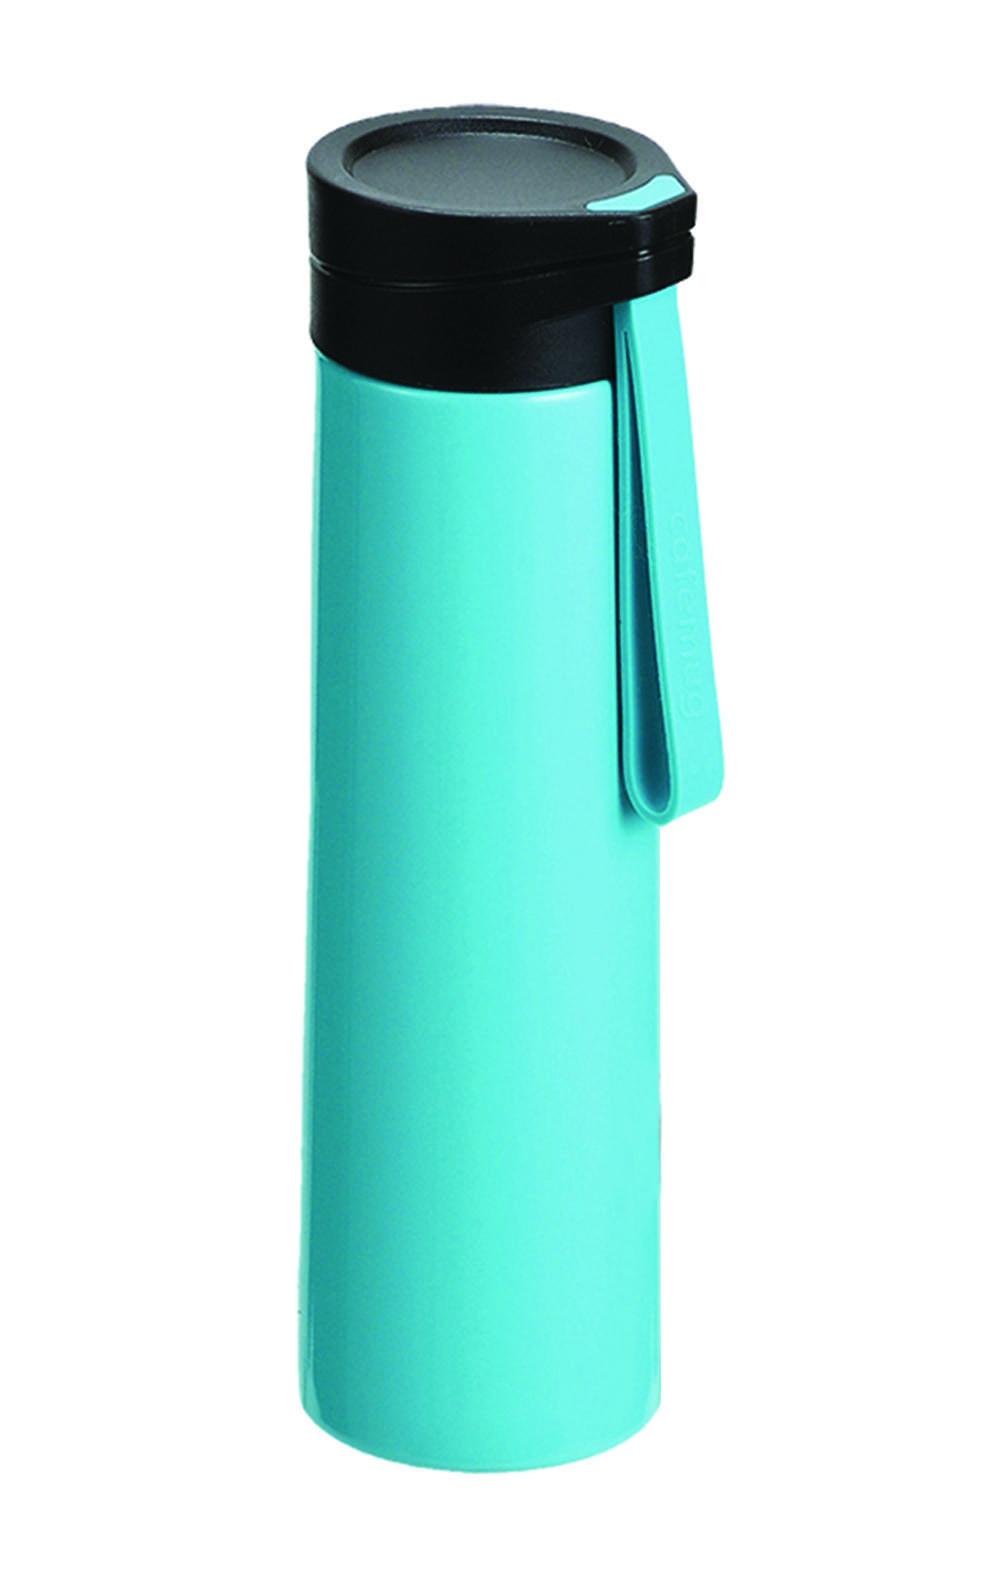 Pearl Metal HB-5179 Cafe Mug Slim with Strap 250 ml